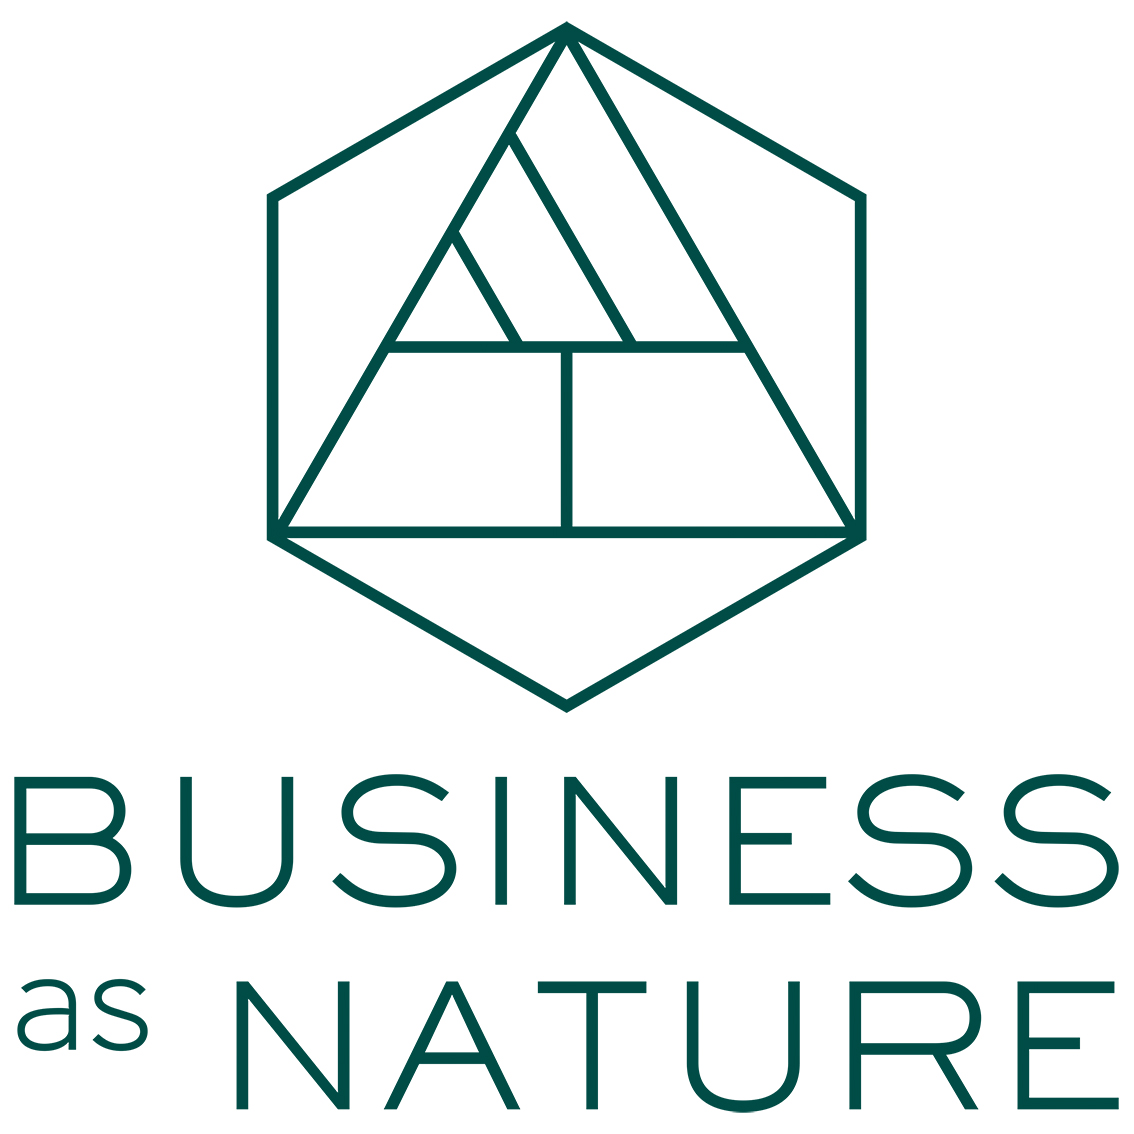 https://europeanplasticspact.org/wp-content/uploads/2020/03/BUSINESS-AS-NATURE.jpg